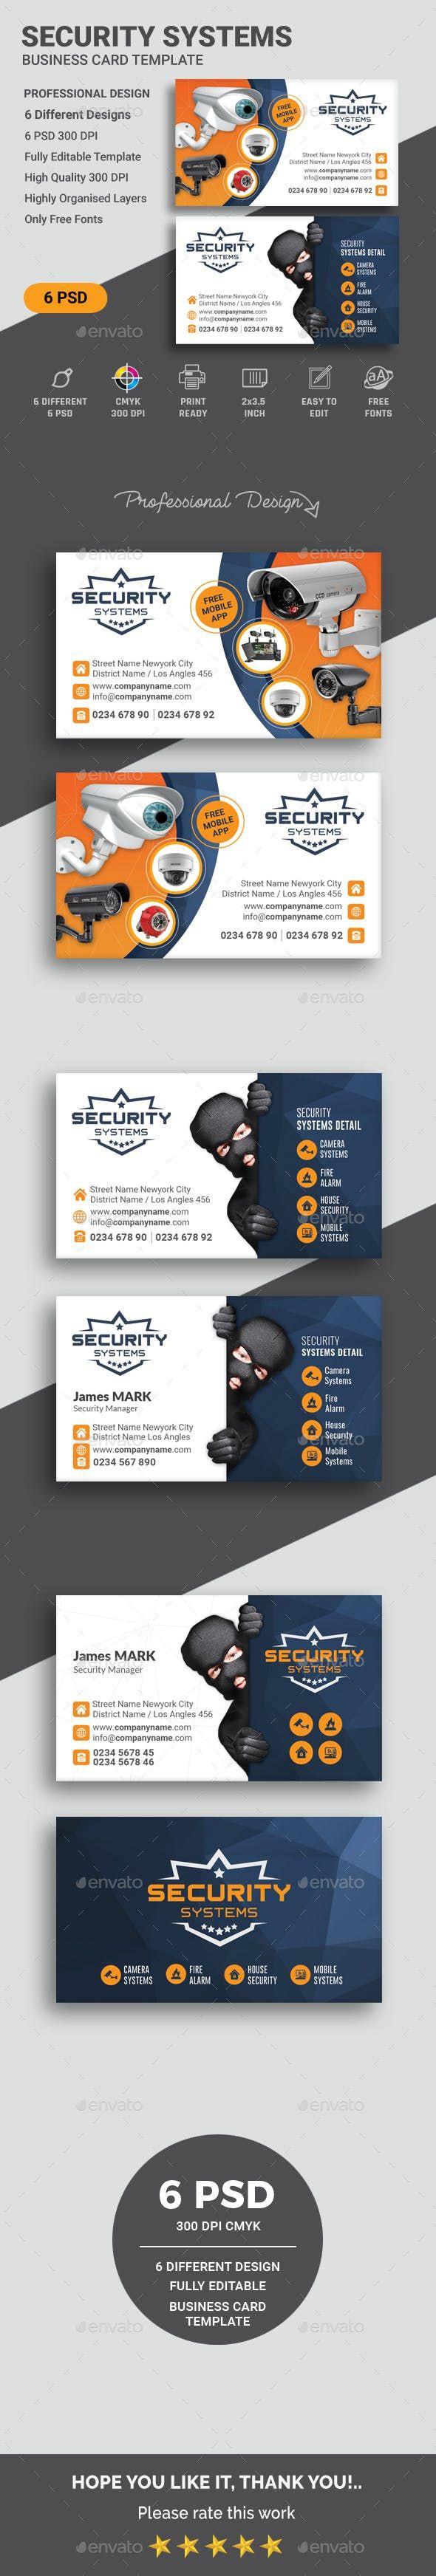 Security Business Card Templates Corporate Business Cards Corporate Business Card Business Card Design Minimal Minimalist Business Cards